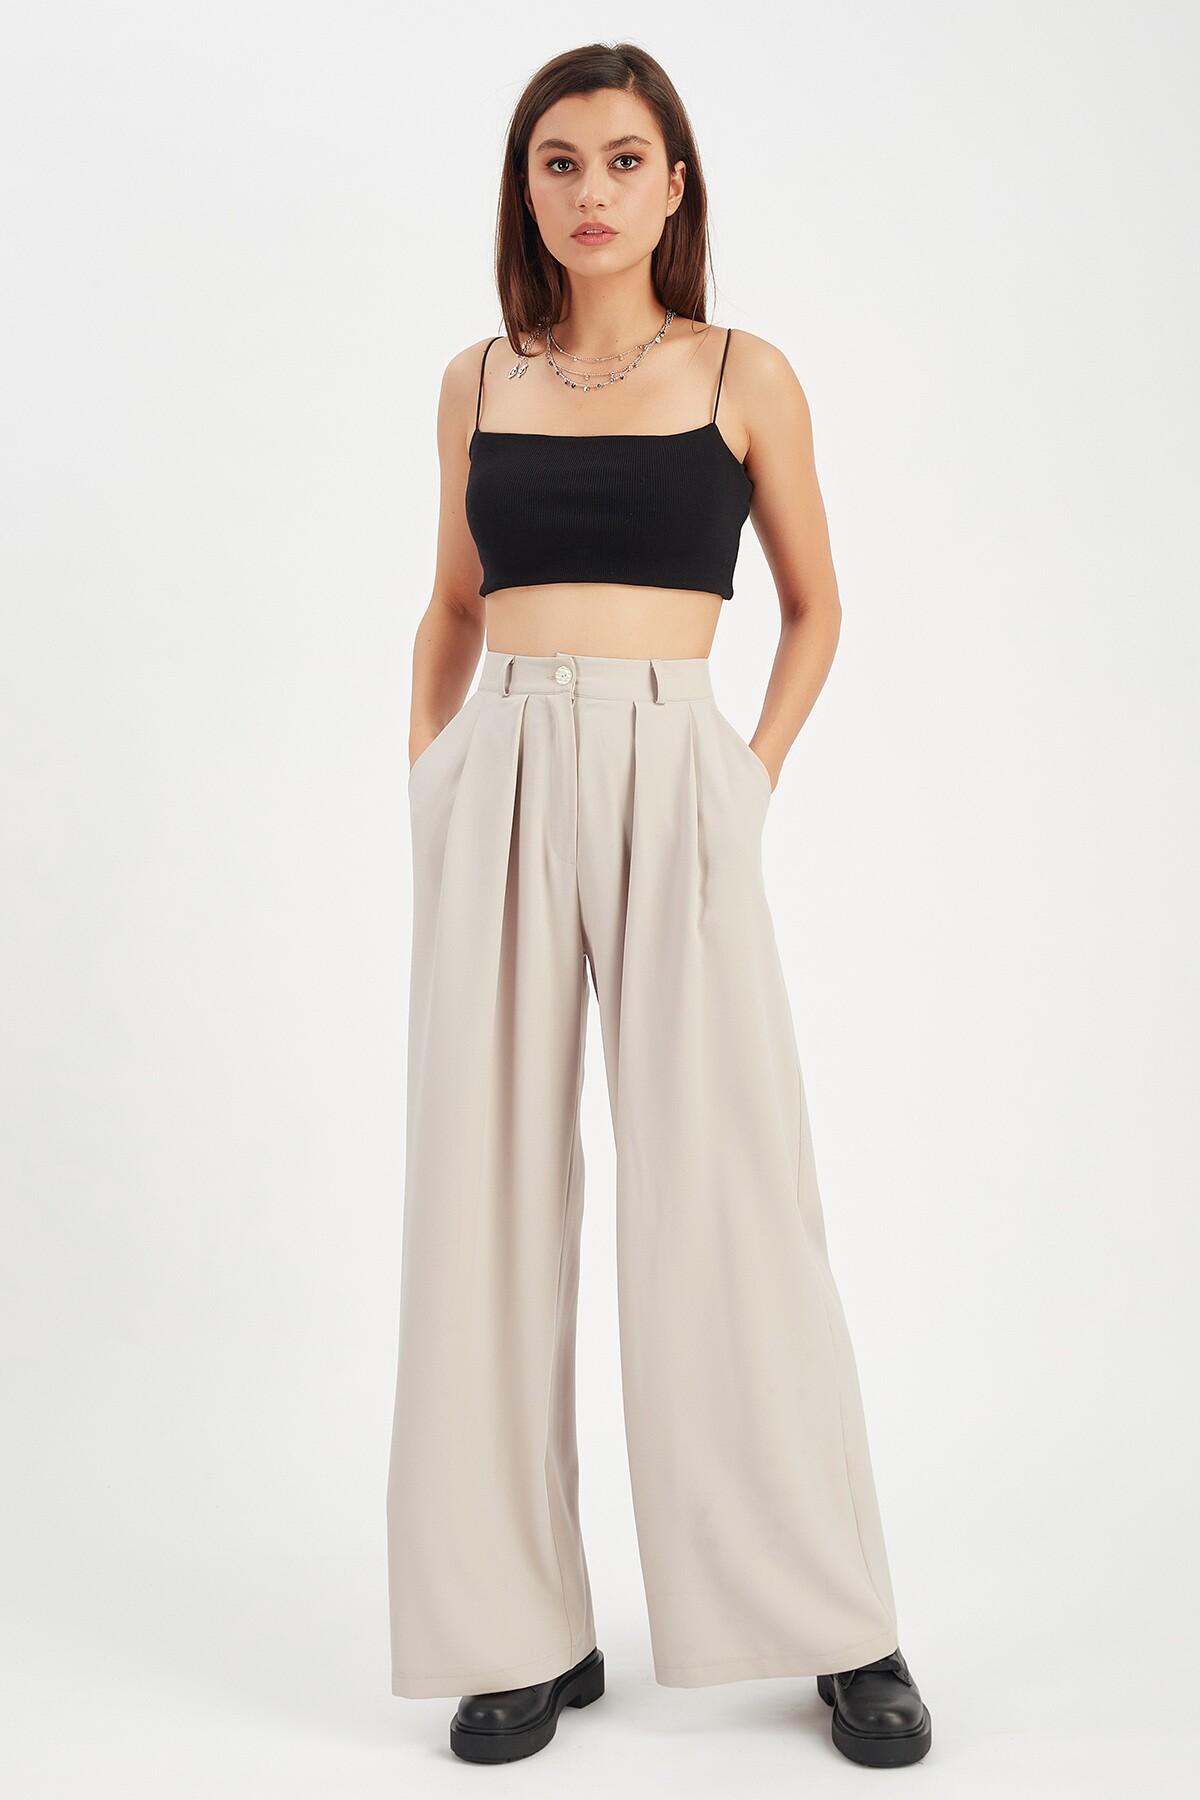 Taş Kadın Pantolon | Mk21W660129